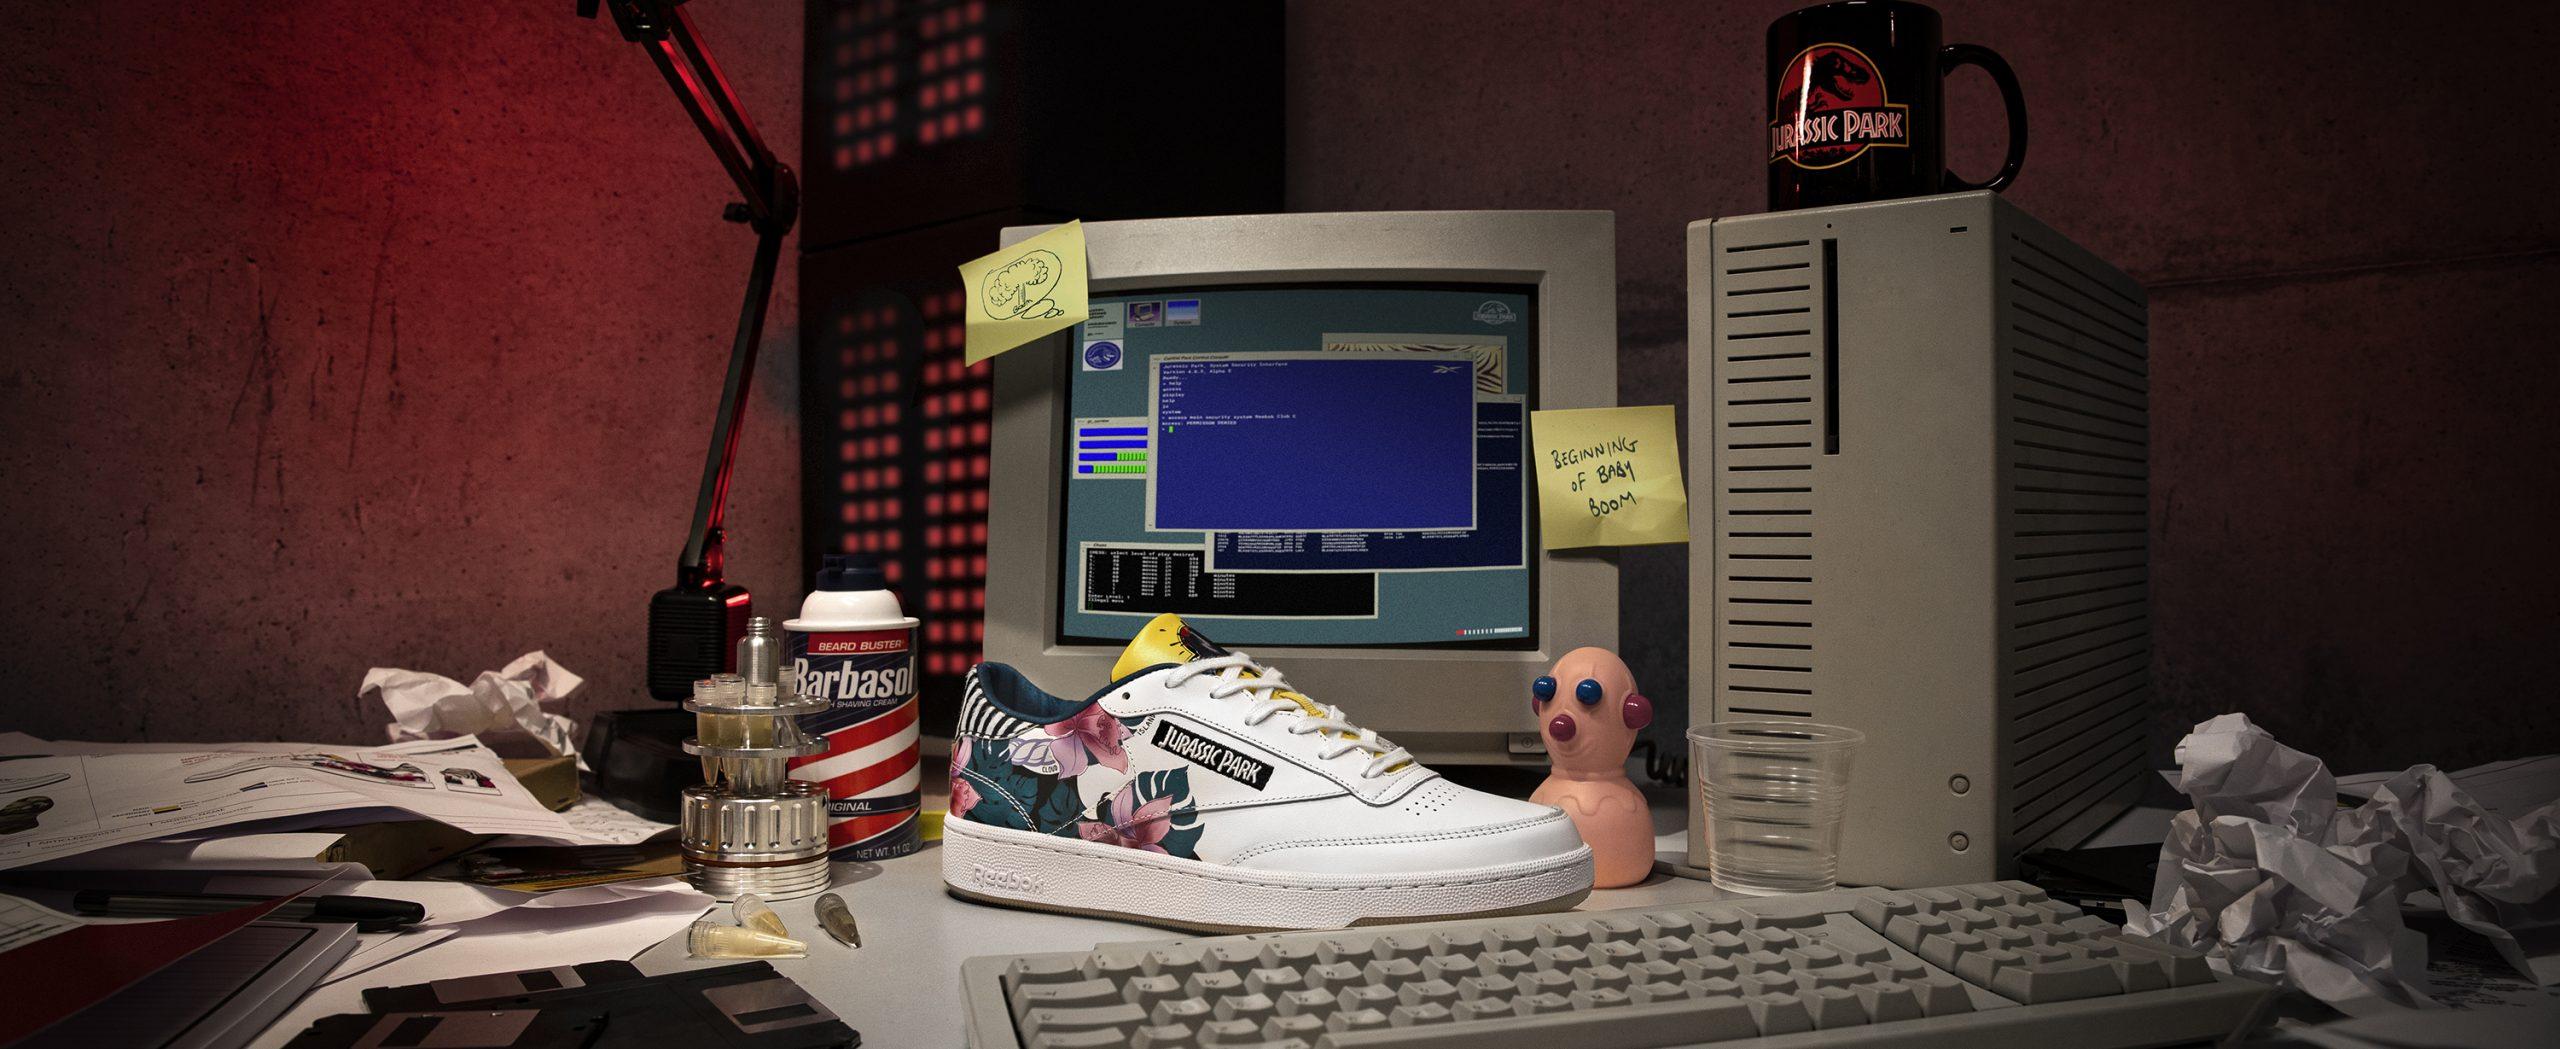 REEBOK X JURASSIC PARK Footwear & Apparel Collection REVEALED!